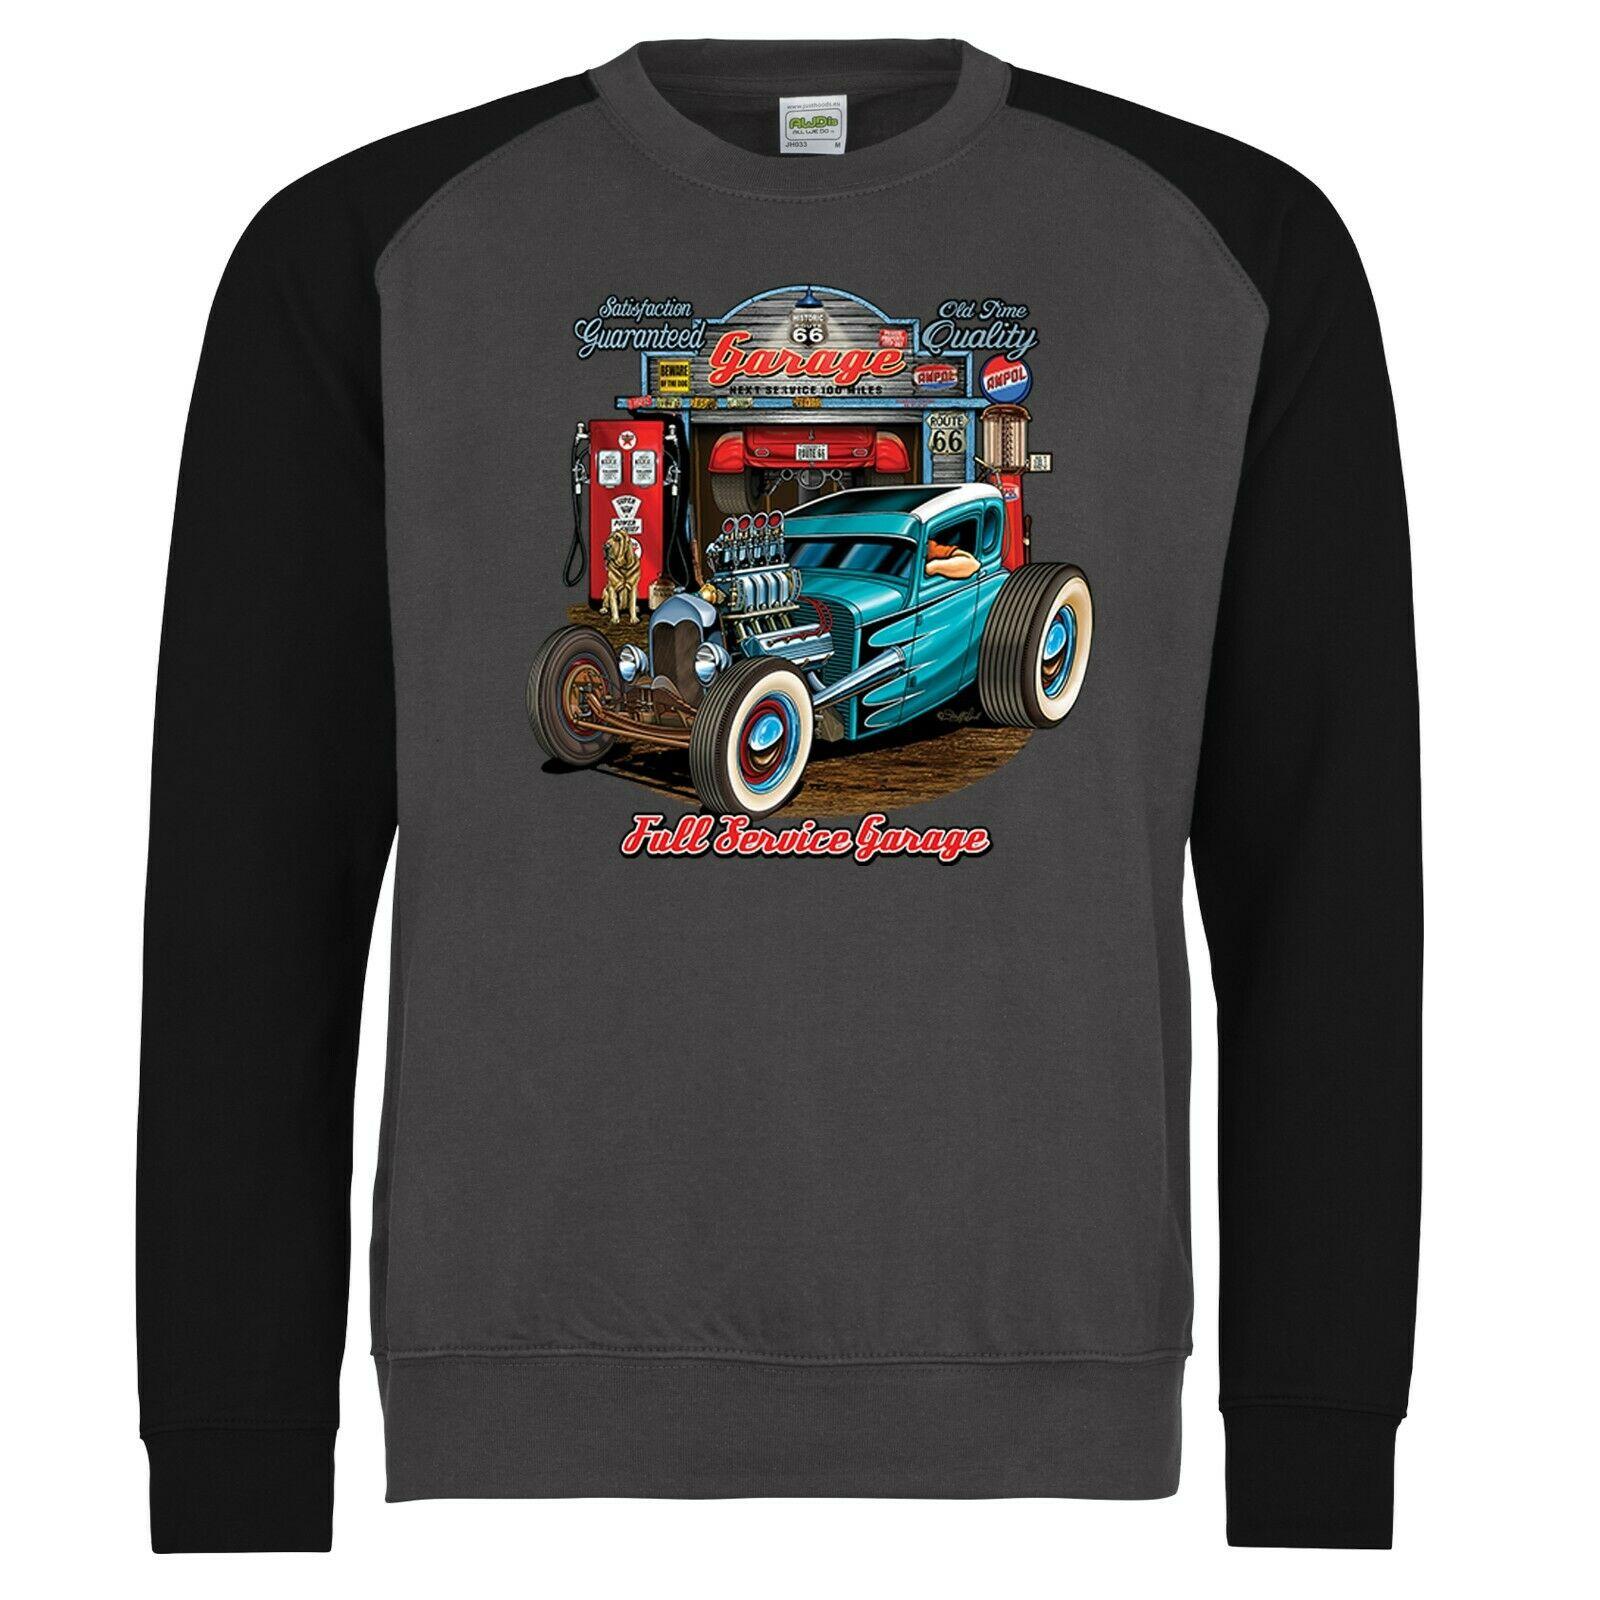 Homme Hotrod 58 Hot Rod T Shirt American Speed Demon Muscle Garage Rockabilly 70